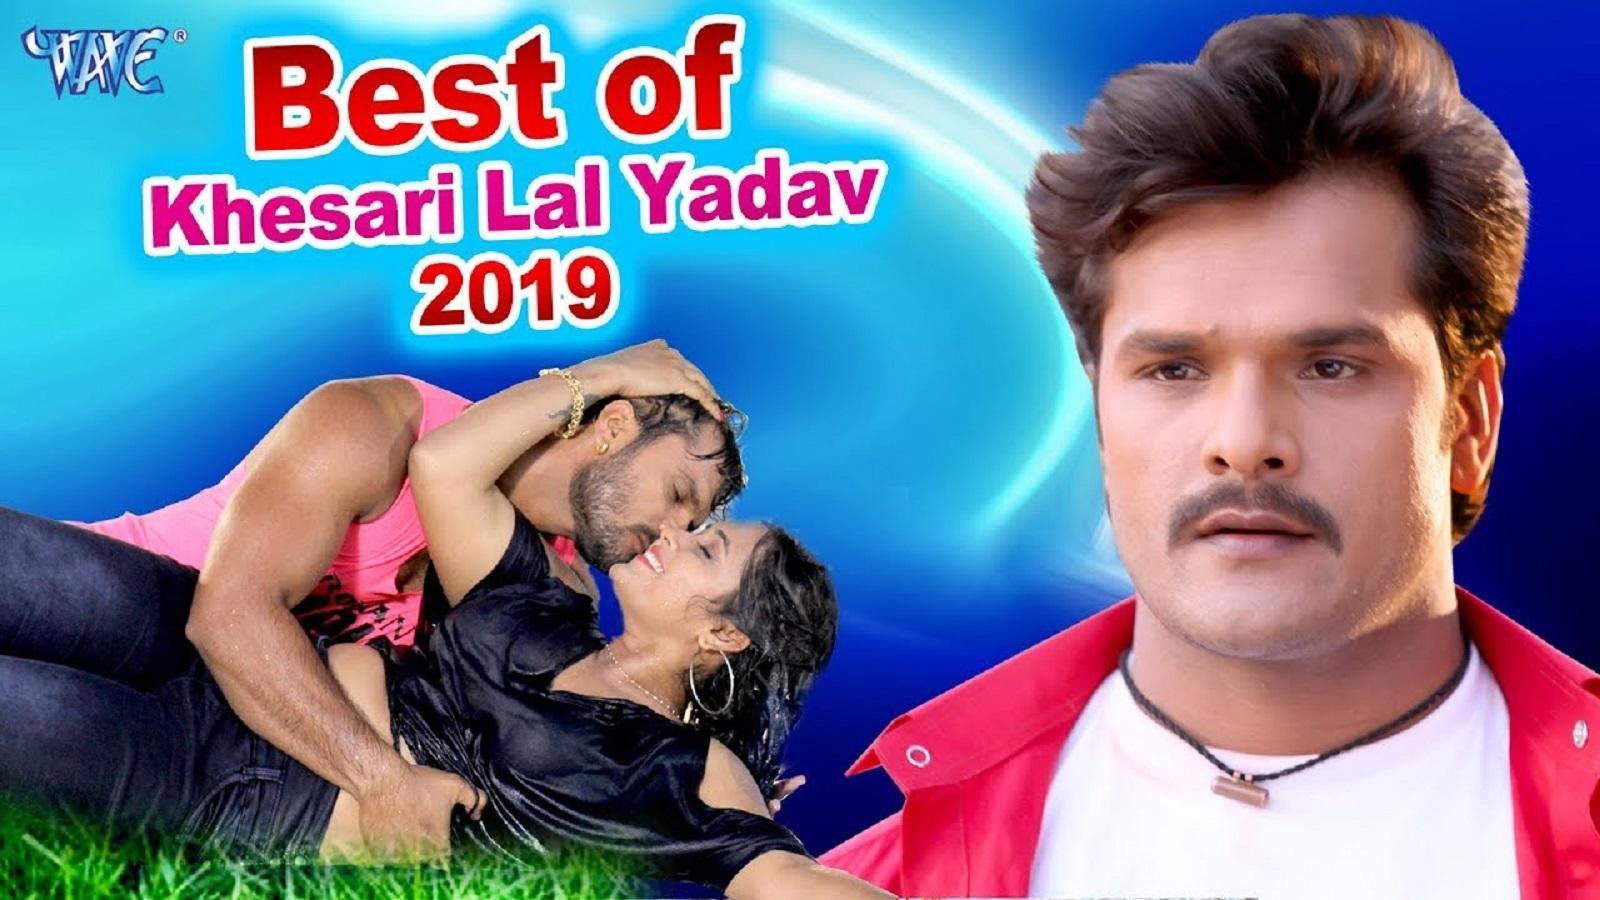 Best of Khesari Lal Yadav 2019: Superhit Bhojpuri songs non-stop videos  JUKEBOX